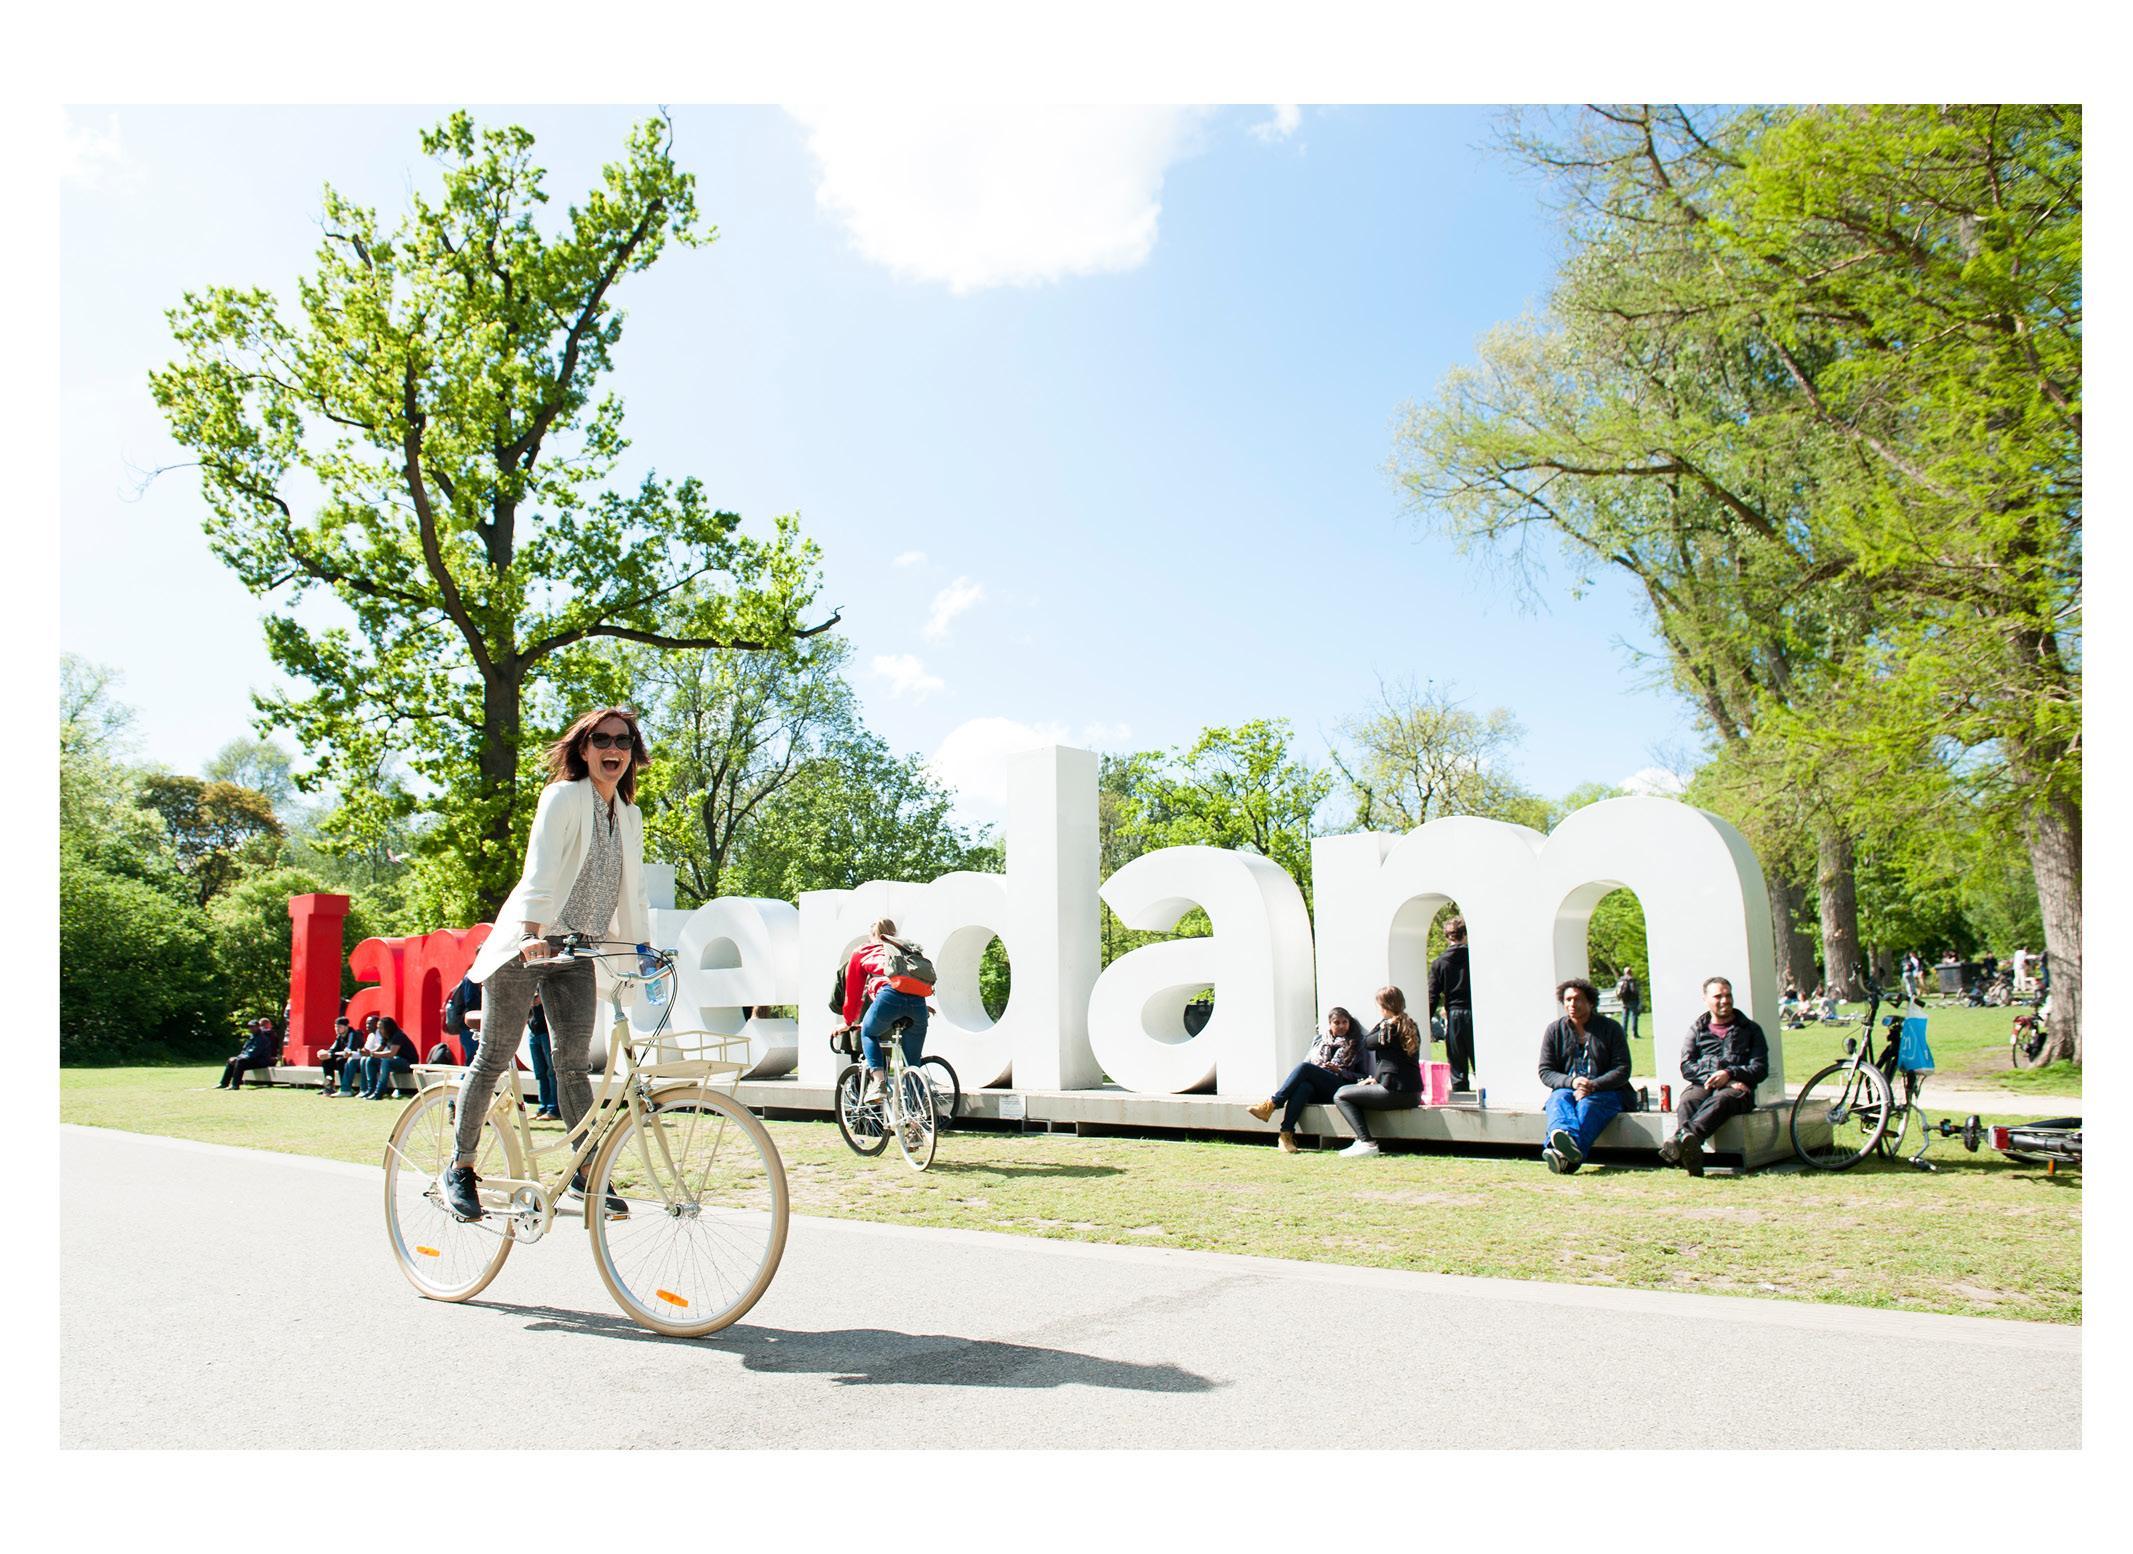 Style Trip à Amsterdam avec Odette